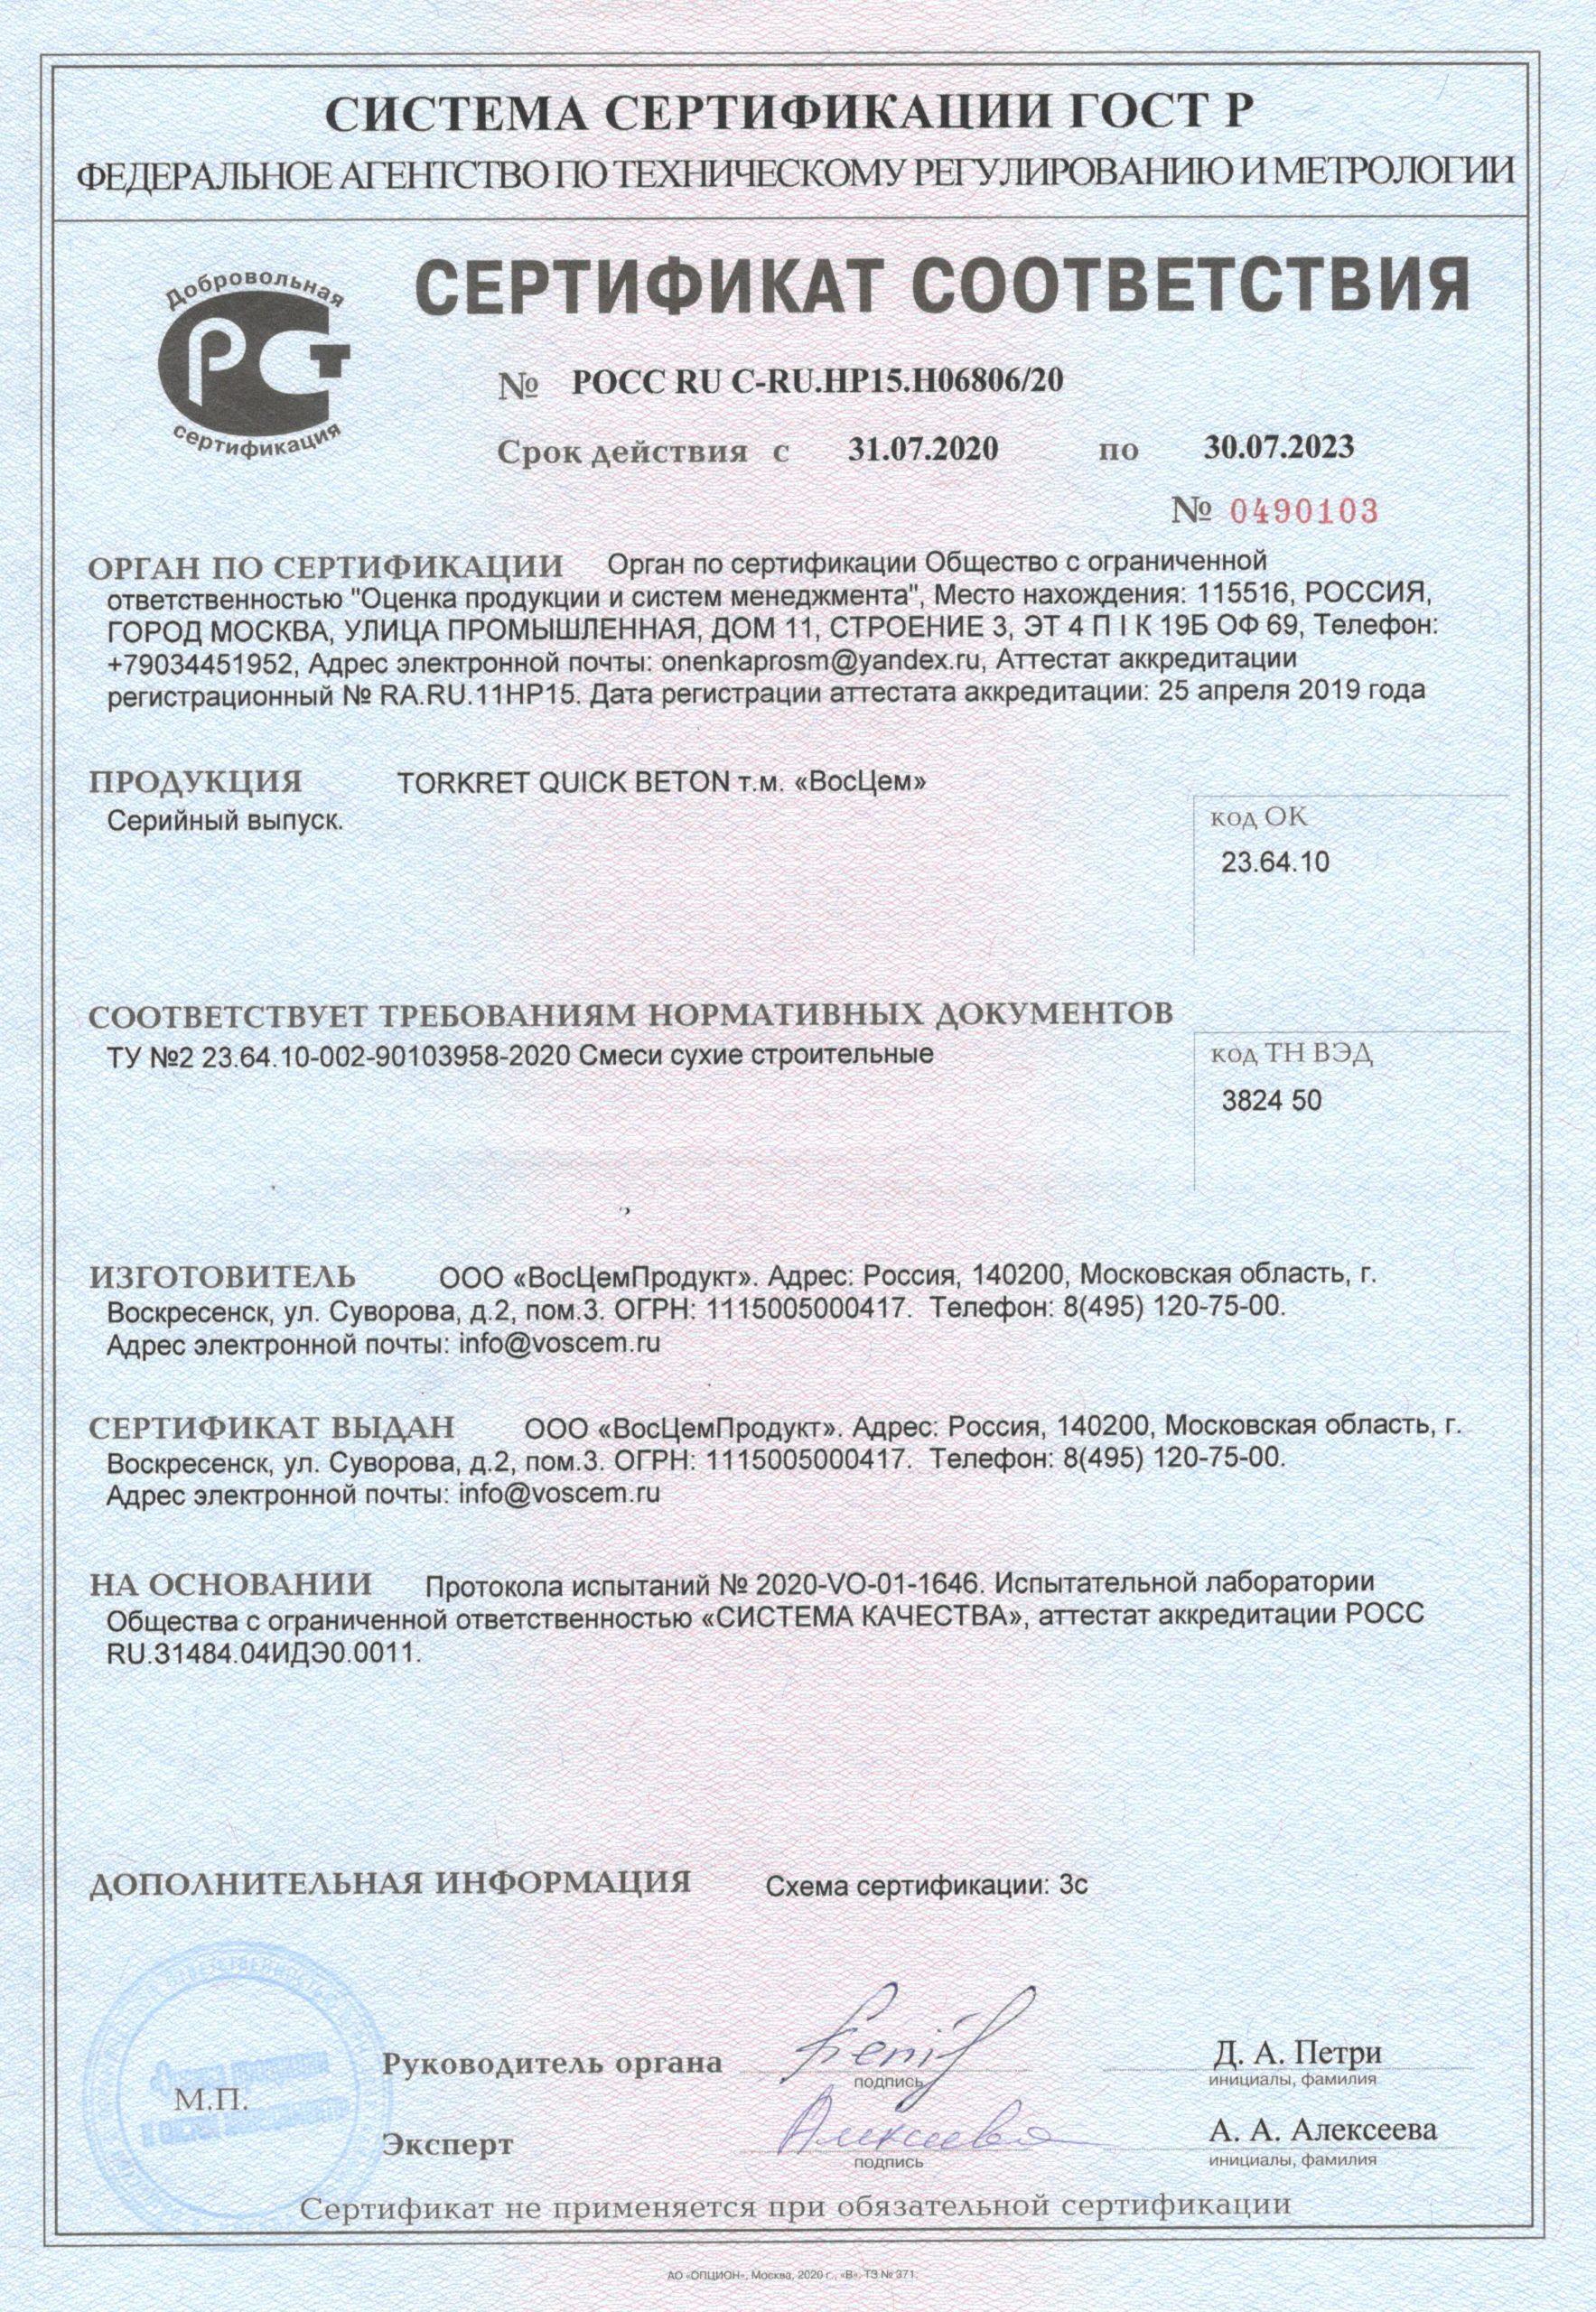 Сертификат на TORKRET QUICK BETON